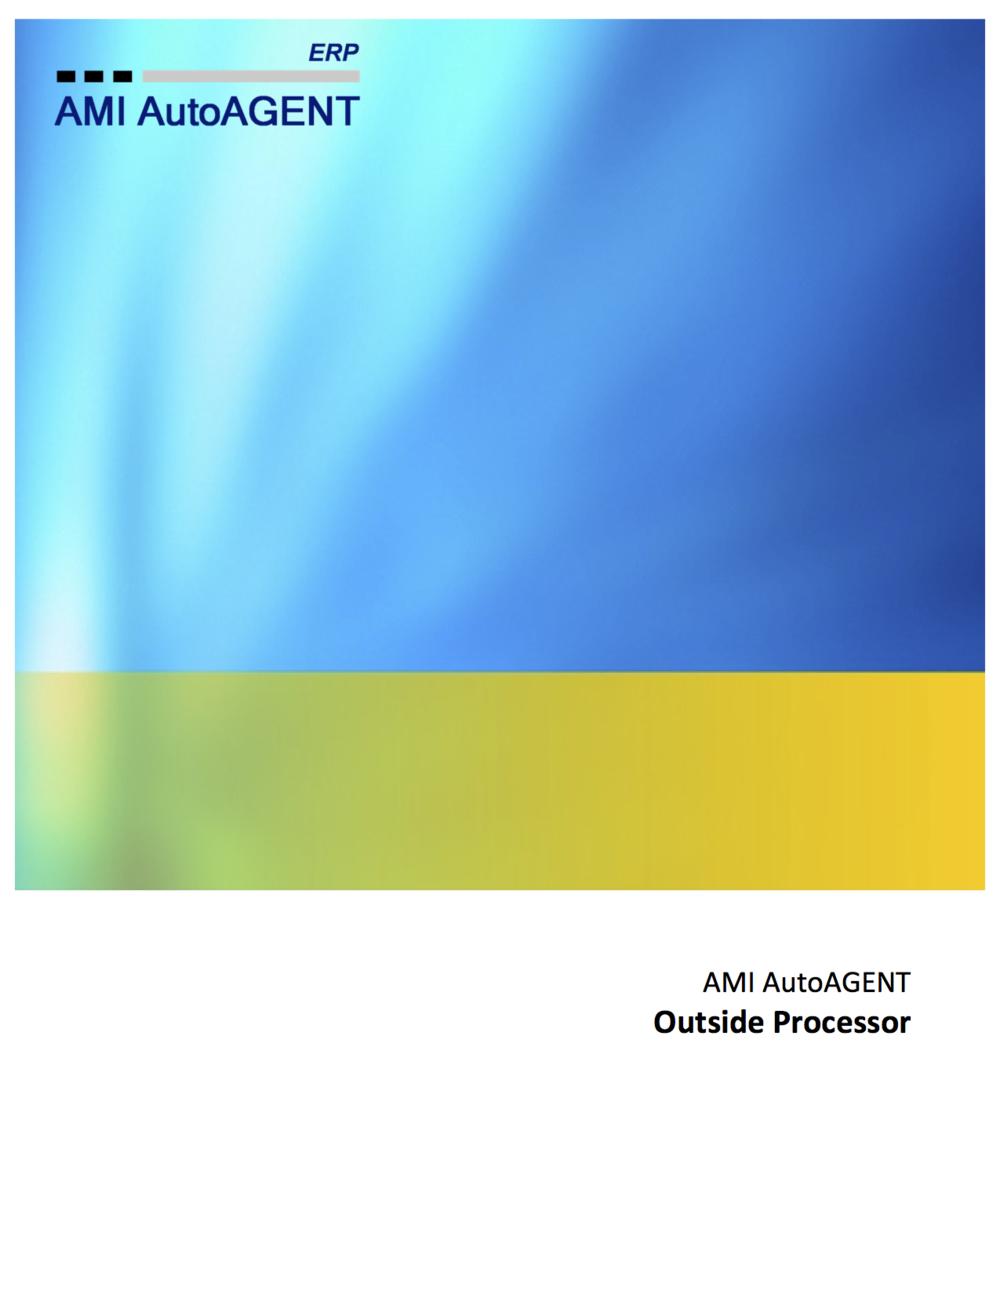 Outside Processor